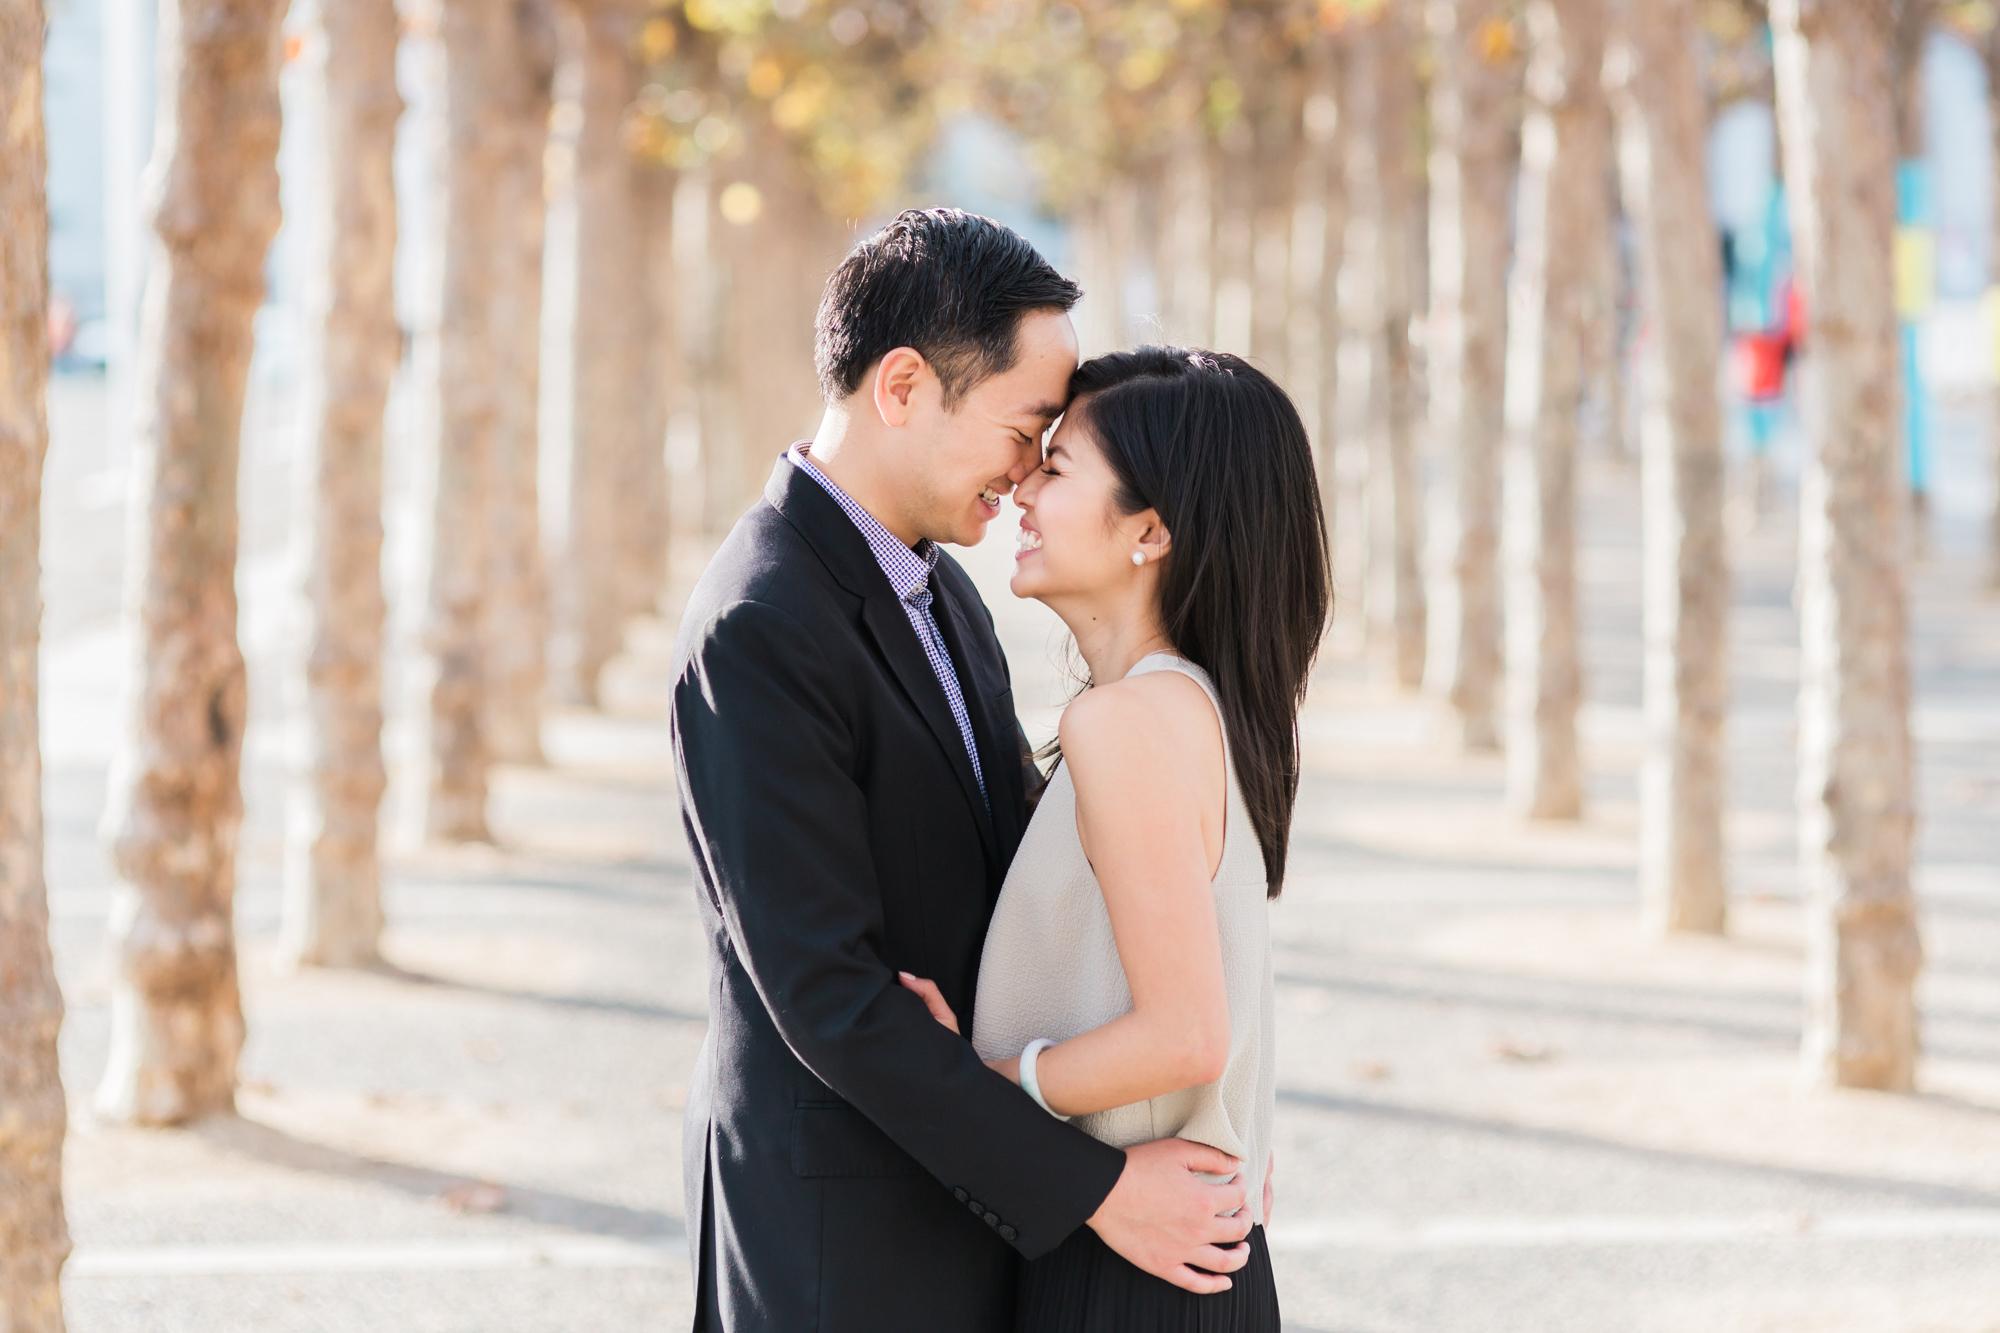 joeewong-jaal-california-san-francisco-engagement-15